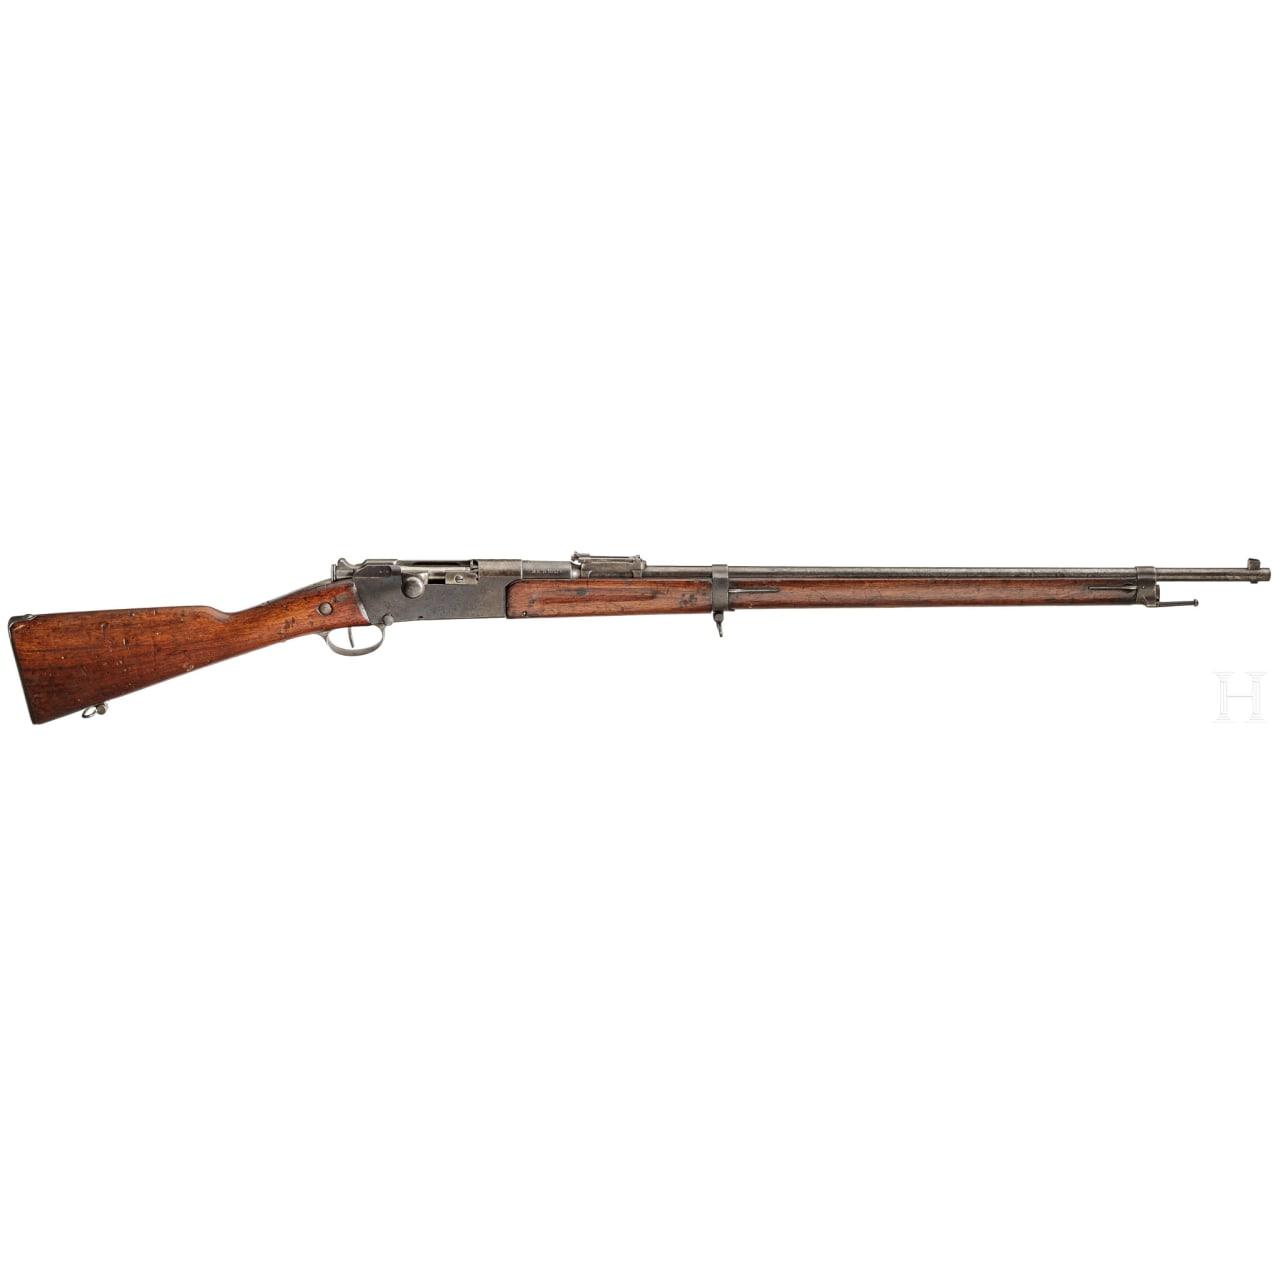 Fusil Lebel M 1886 - M 93